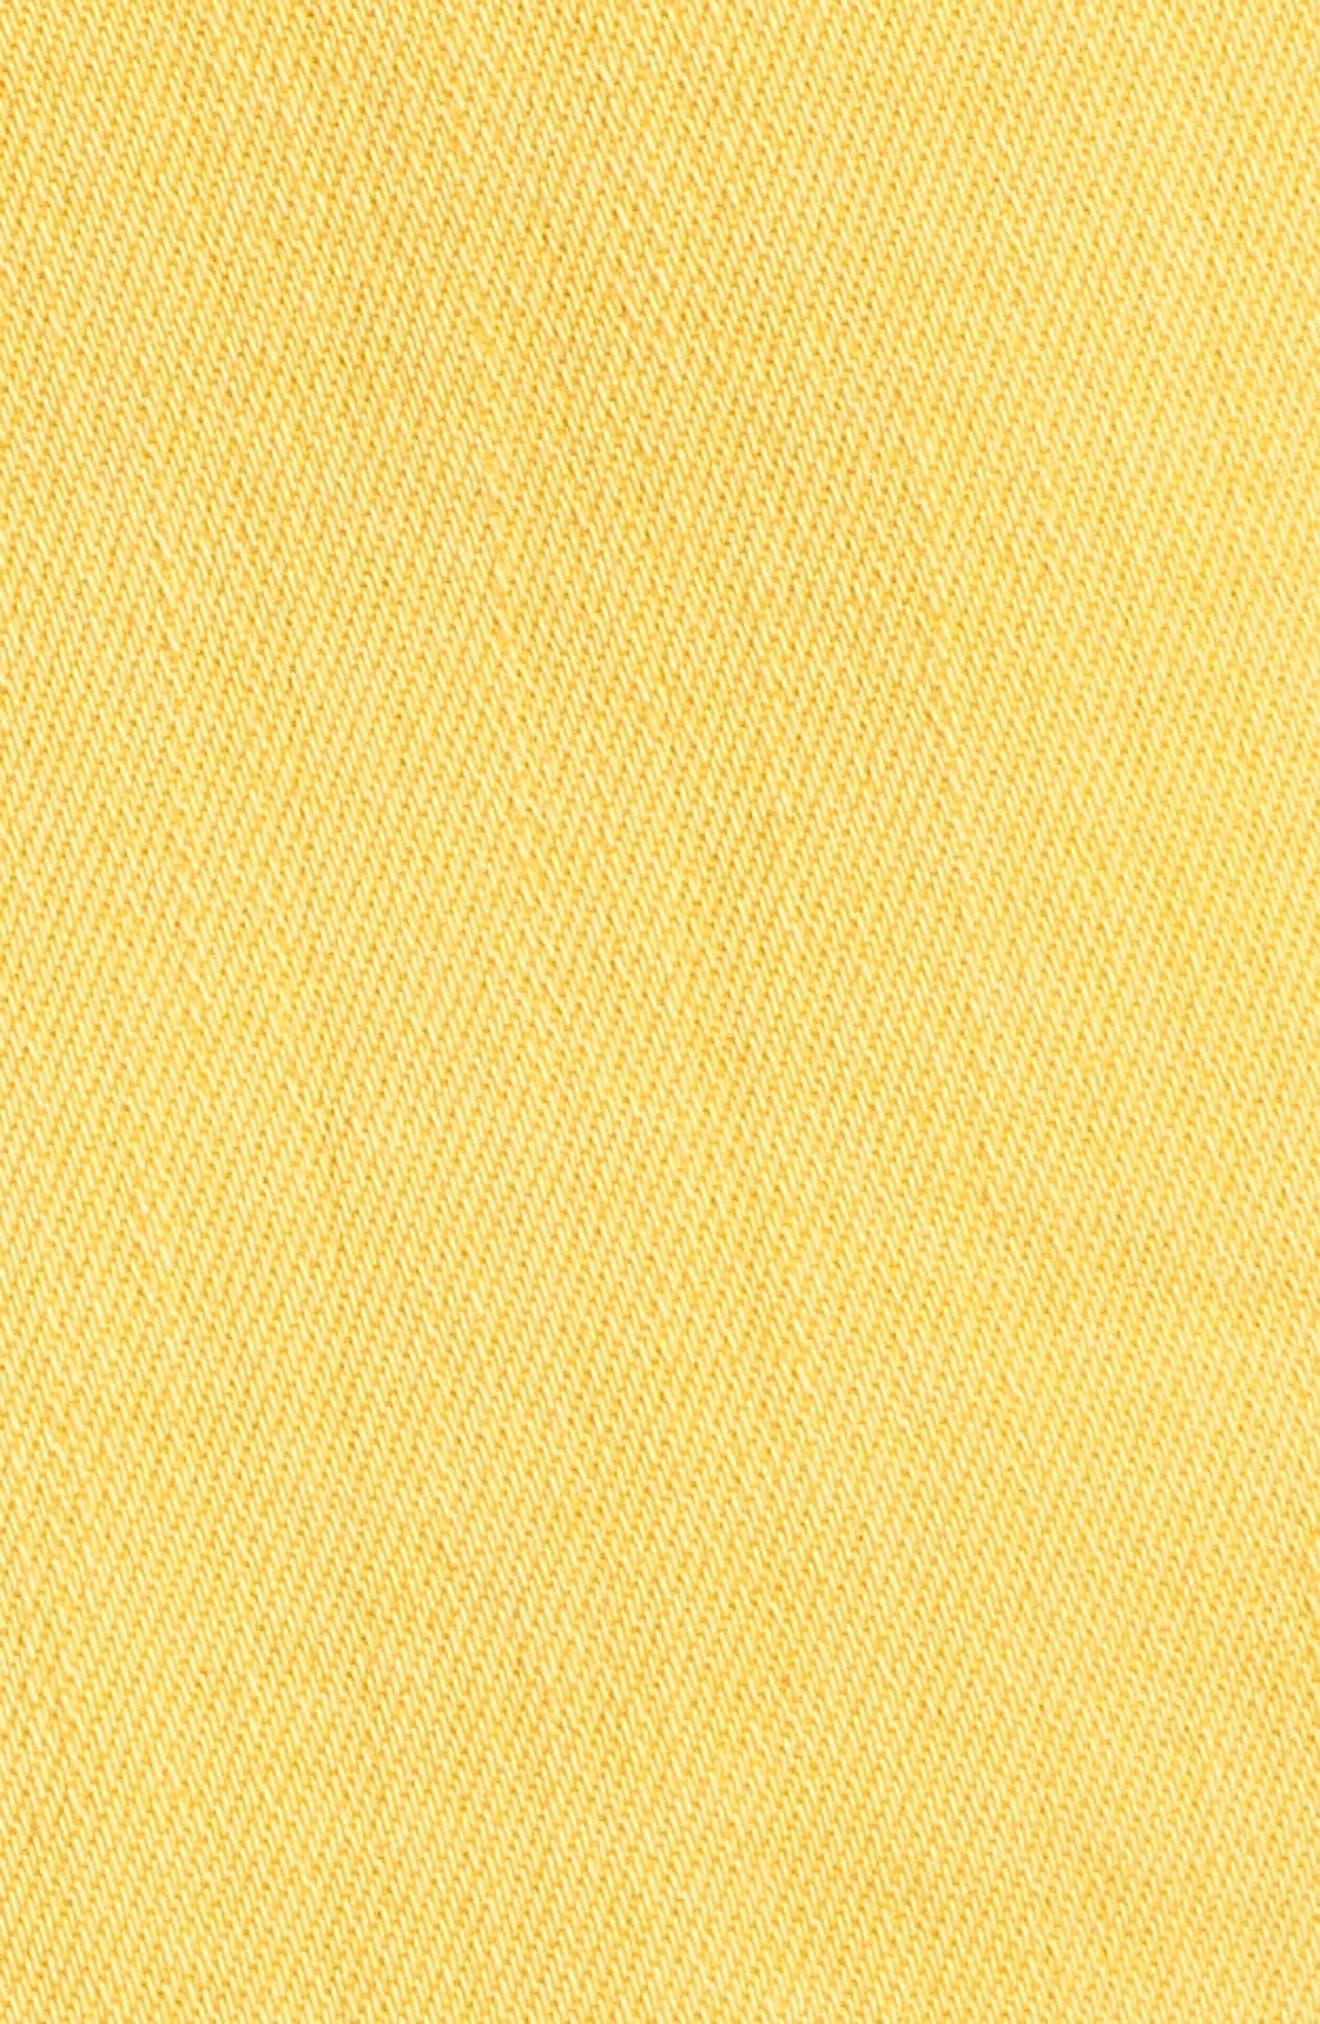 Decon Ripped Denim Shorts,                             Alternate thumbnail 6, color,                             701